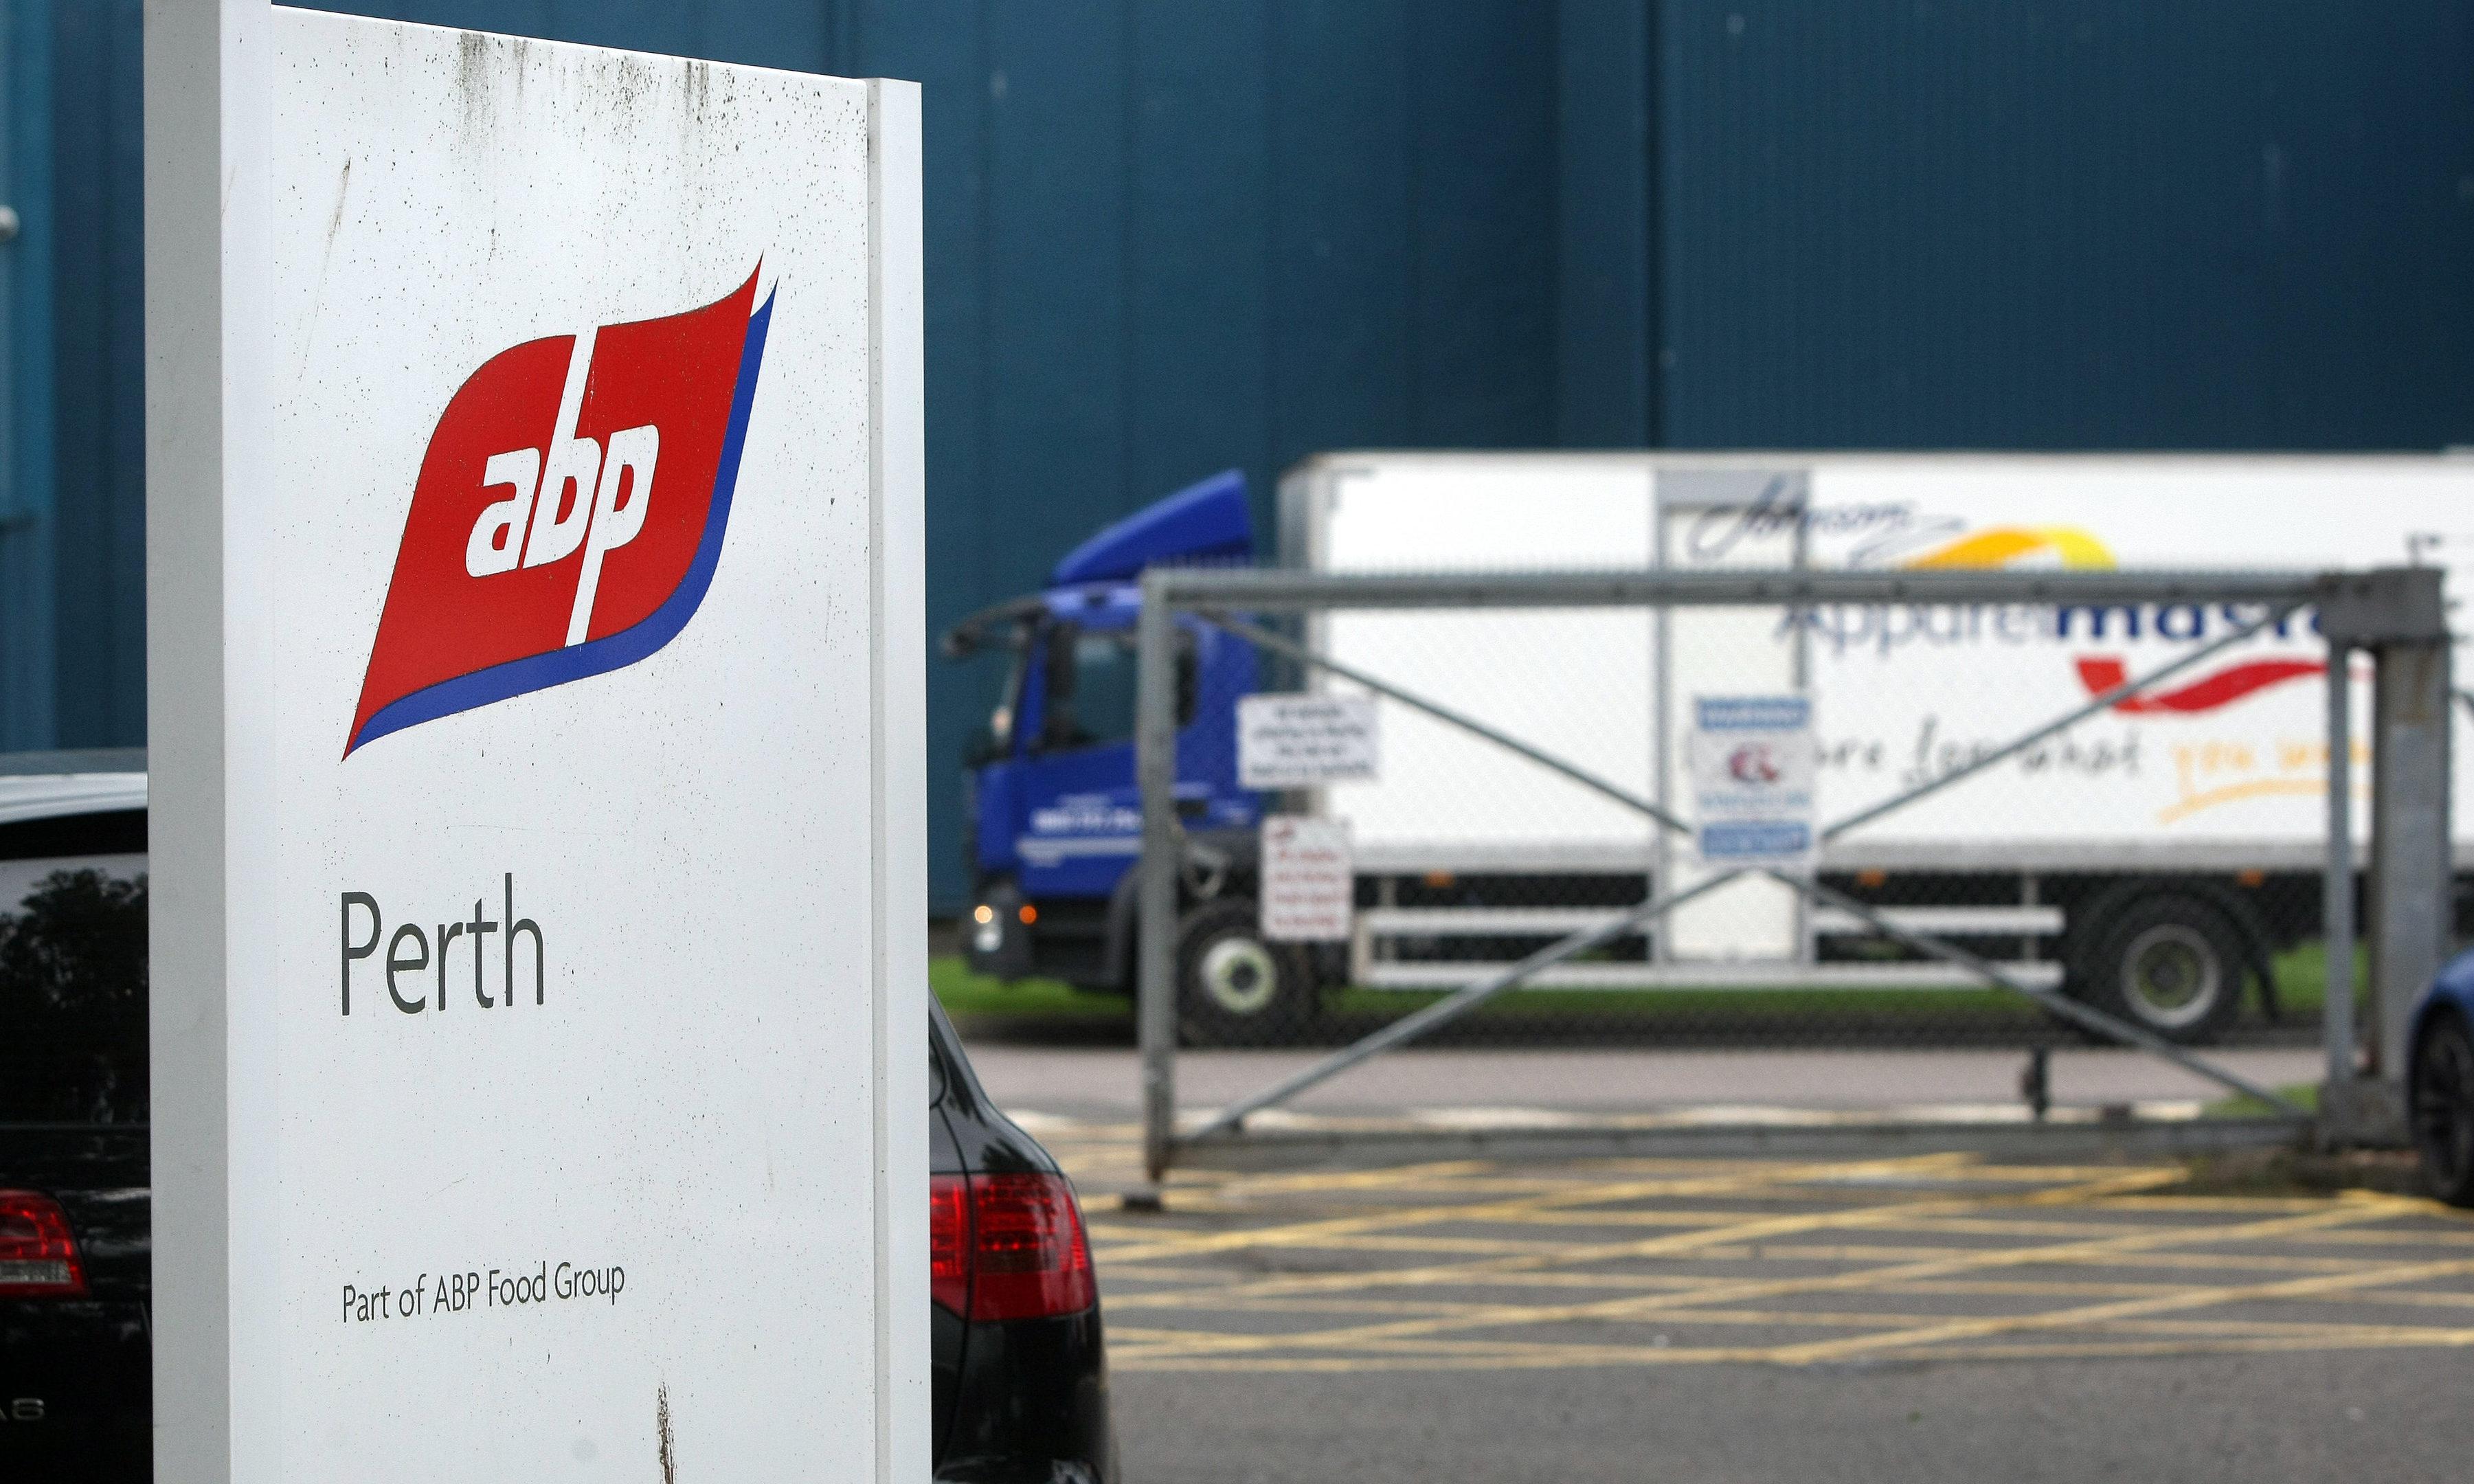 ABP Perth